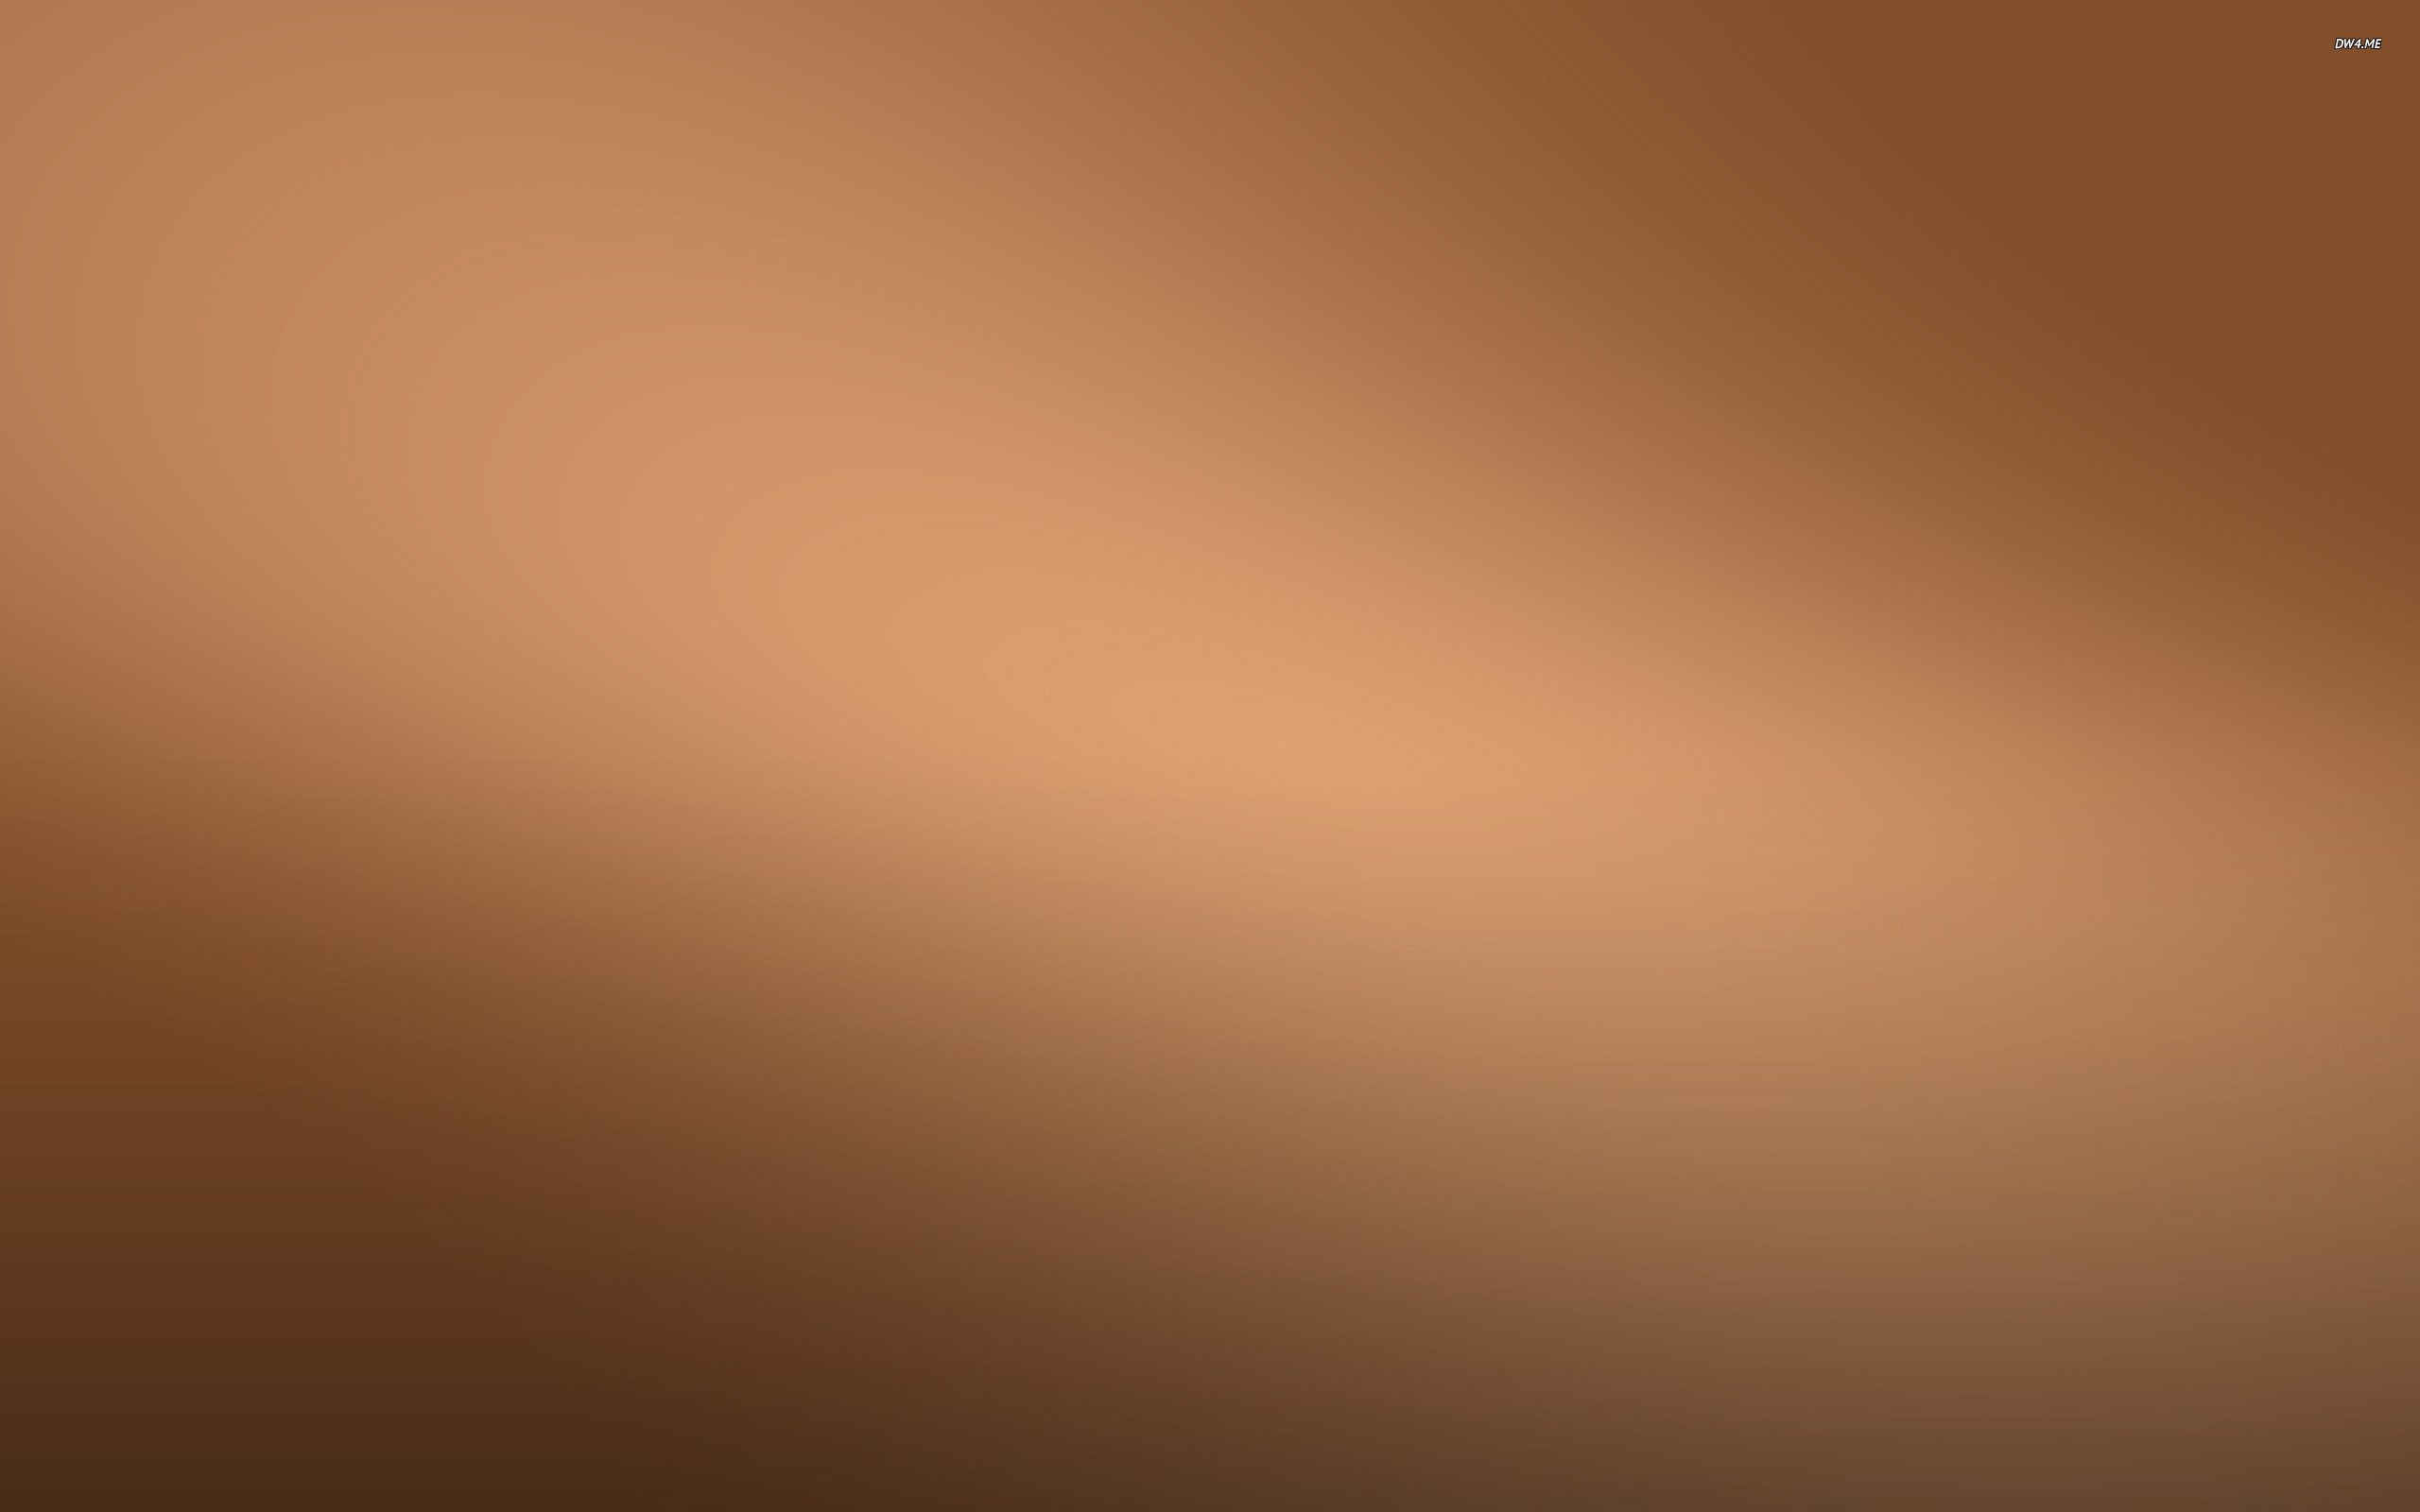 #781468533 Bronze Wallpaper for PC, Mobile